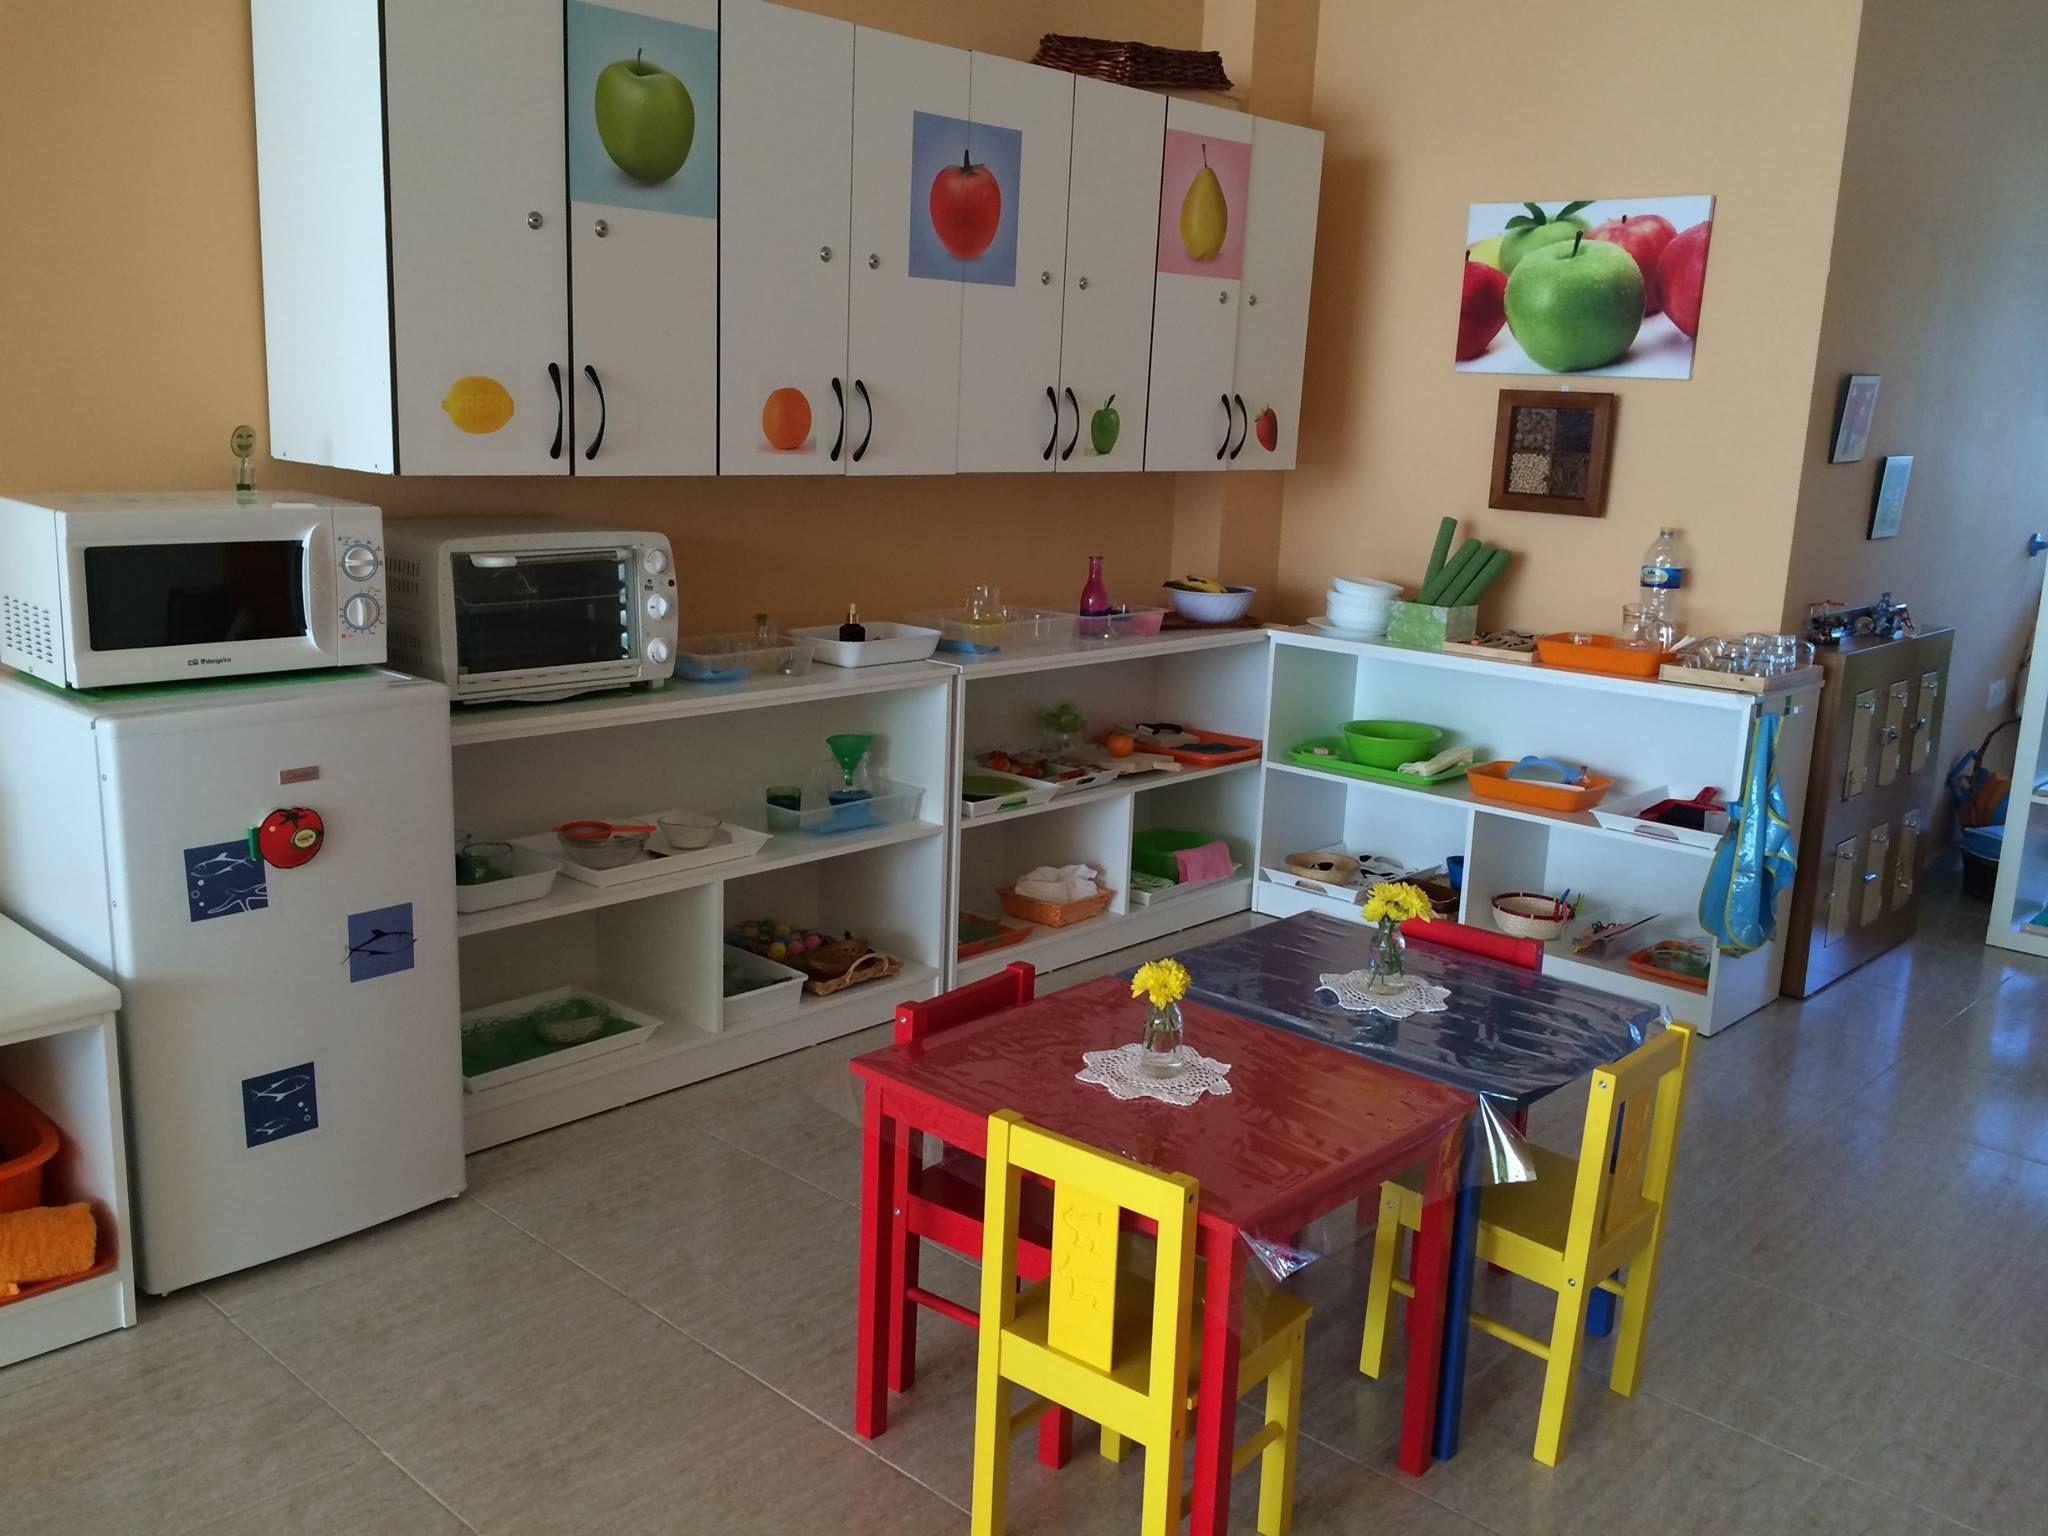 Casa de ni os montessori en zafra ambiente montessori for Casa practica decoracion